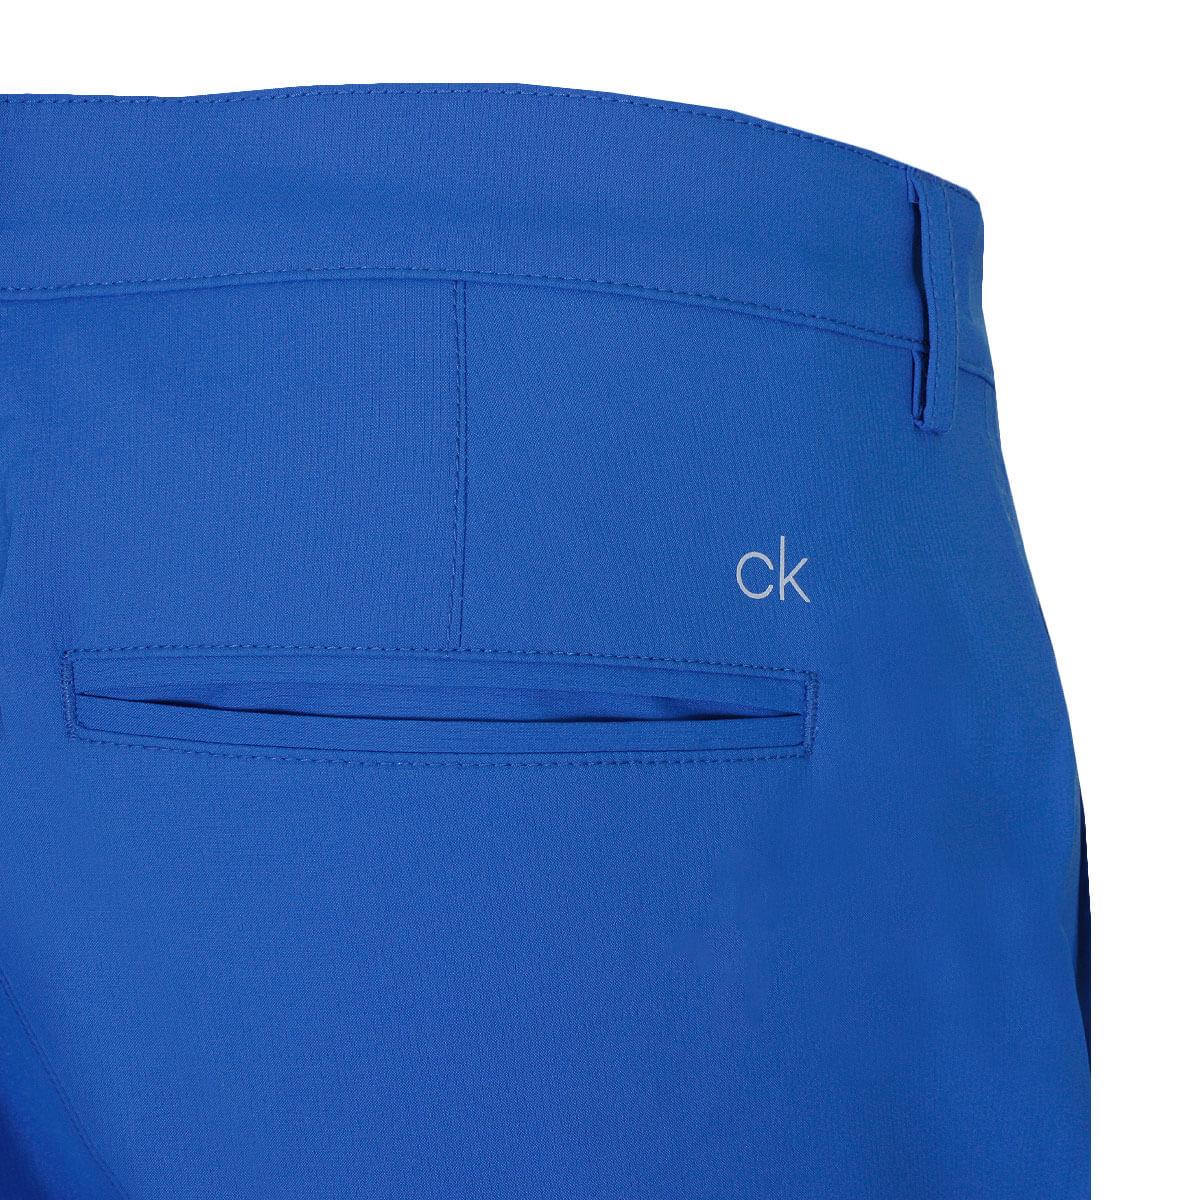 thumbnail 7 - Calvin Klein Mens 2021 Slim Fit Micro Tech Lightweight Golf Shorts 34% OFF RRP